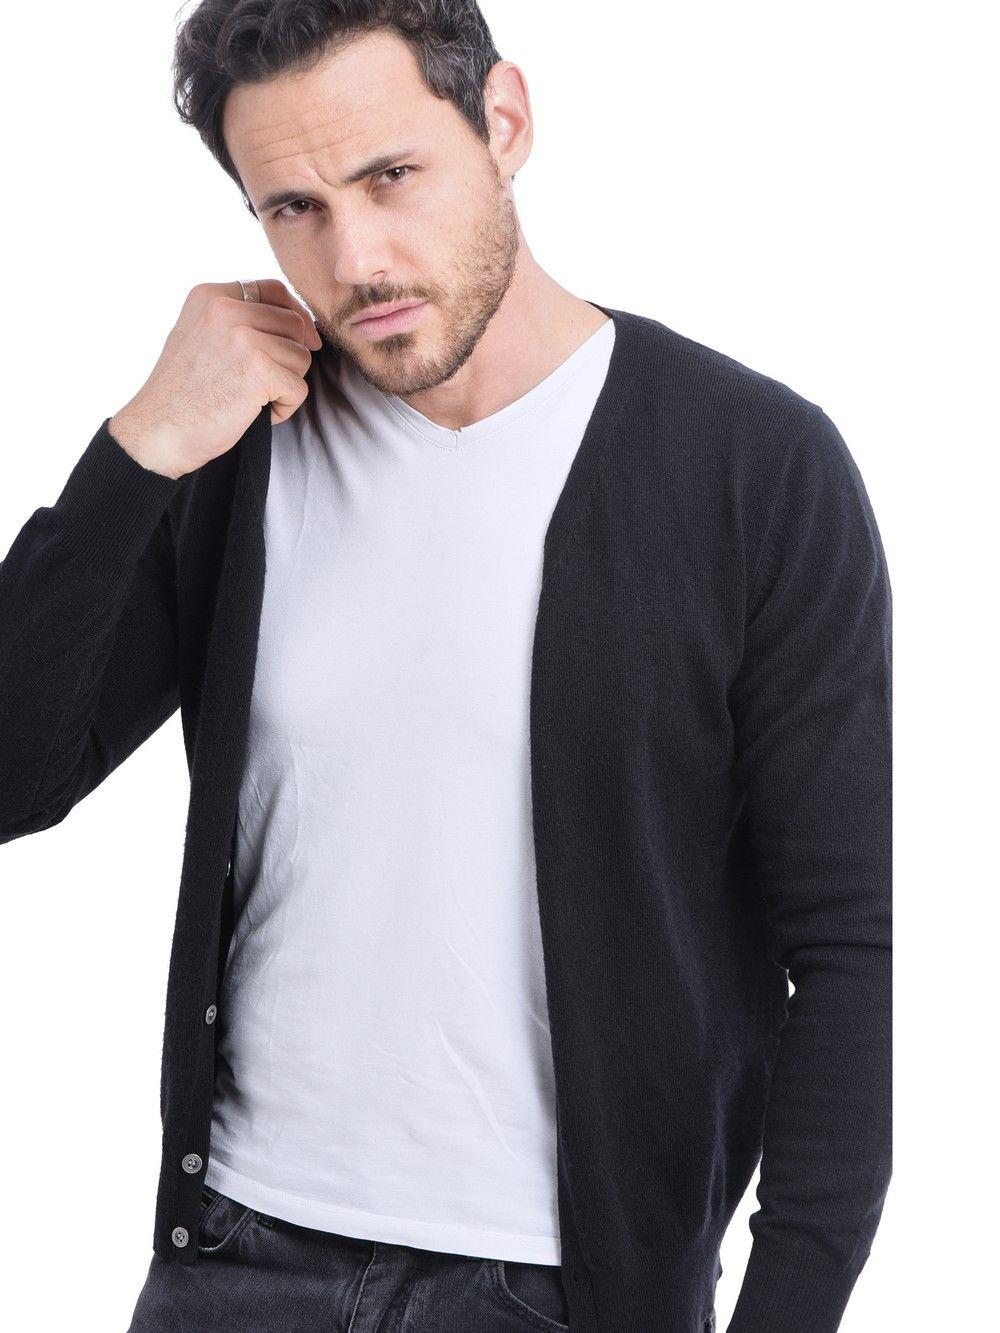 C&JO V-neck Buttoned Cardigan in Black